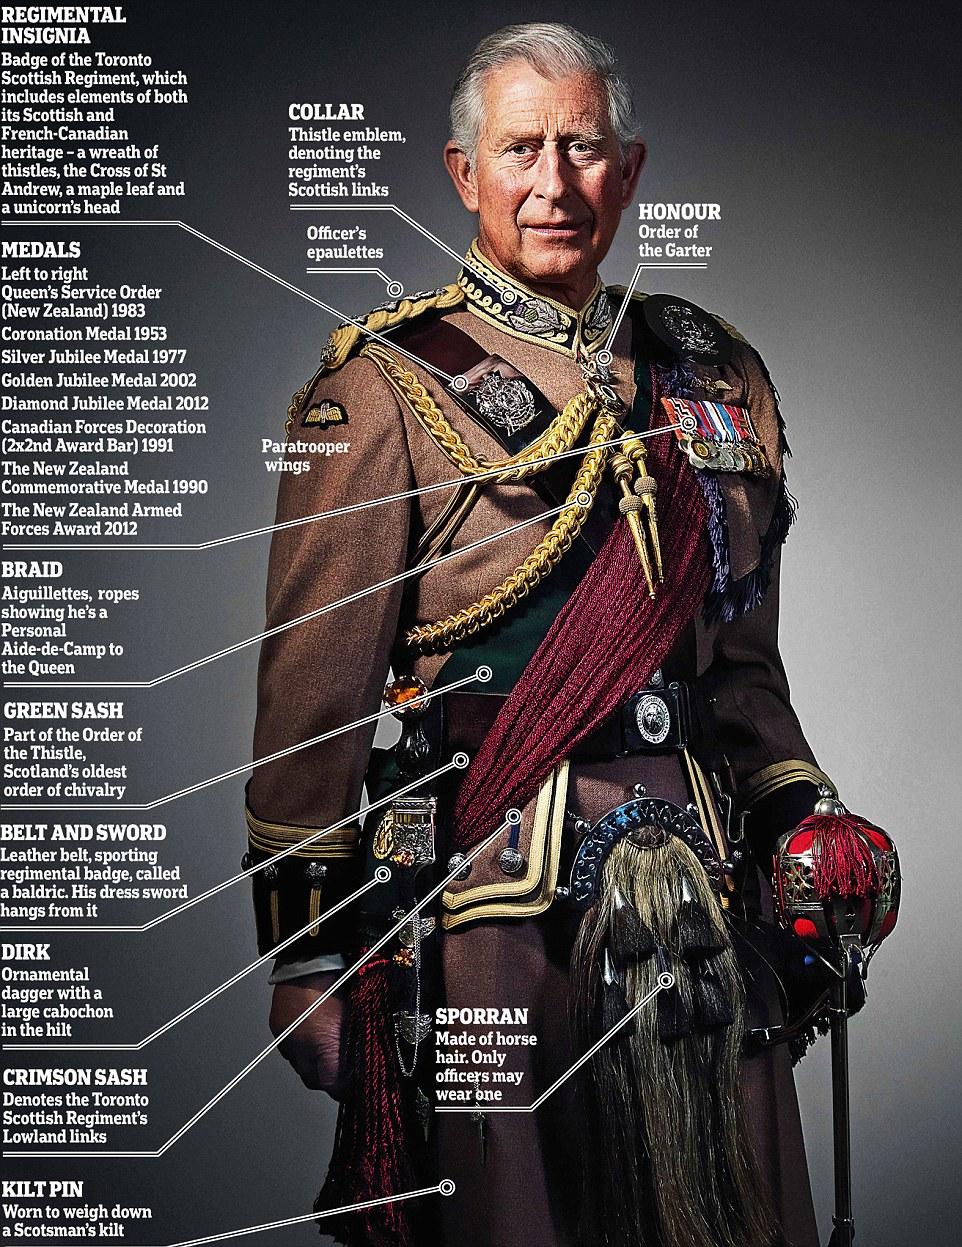 Prince of Wales in the uniform of the Toronto Scottish Regiment (Queen Elizabeth The Queen Mother's Own)